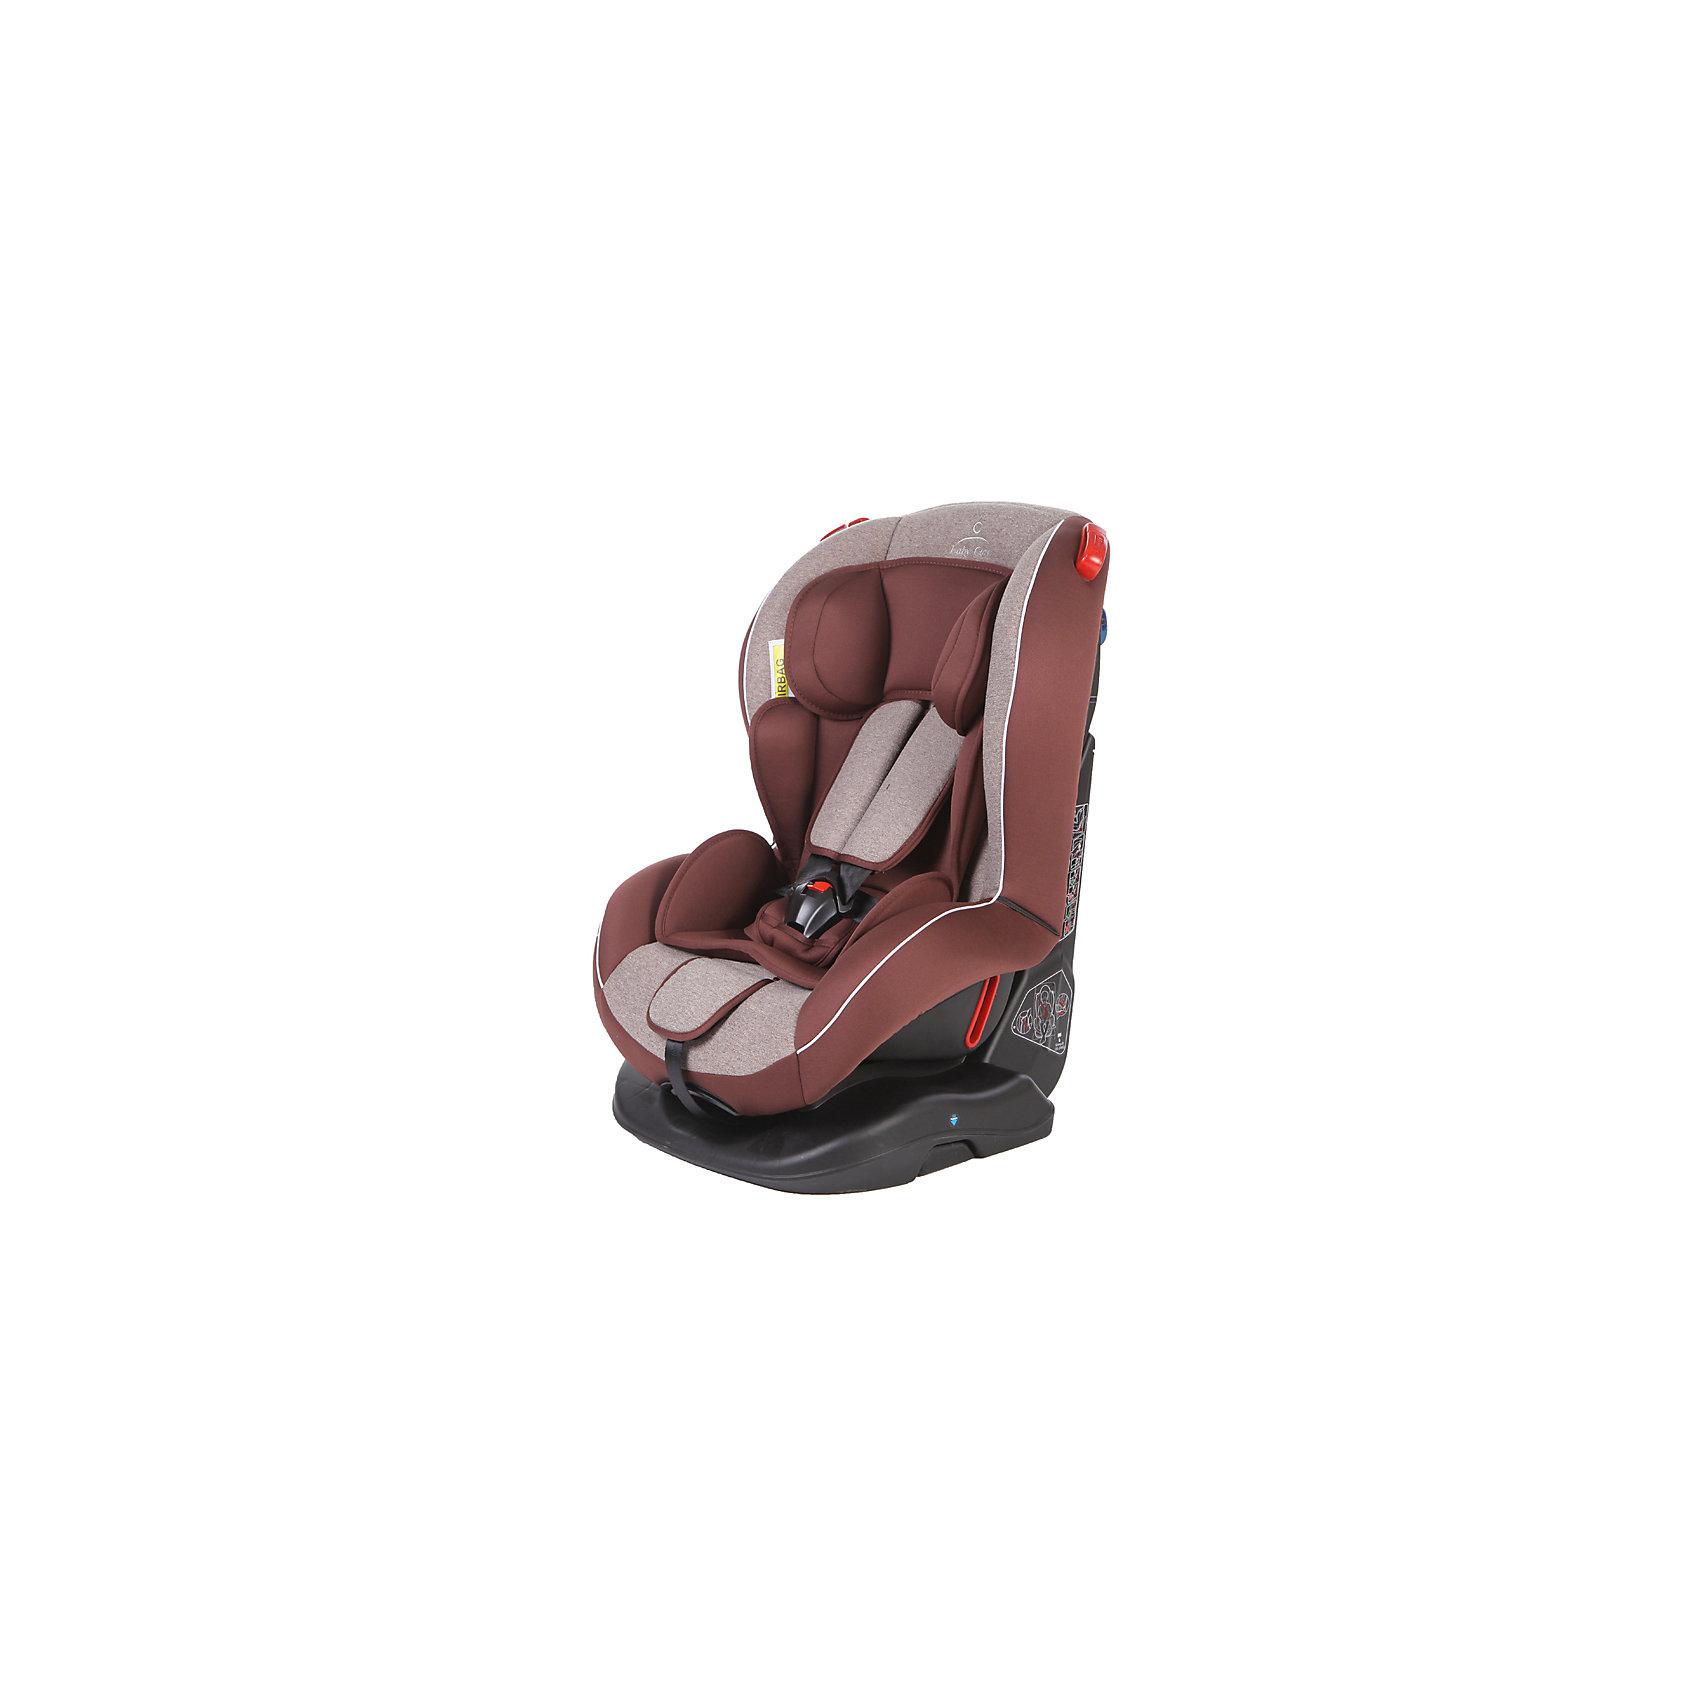 Baby Care Автокресло Basic Evolution 0-25 кг, Baby Care, бежевый/коричневый автокресло baby care eso basic premium темно серое